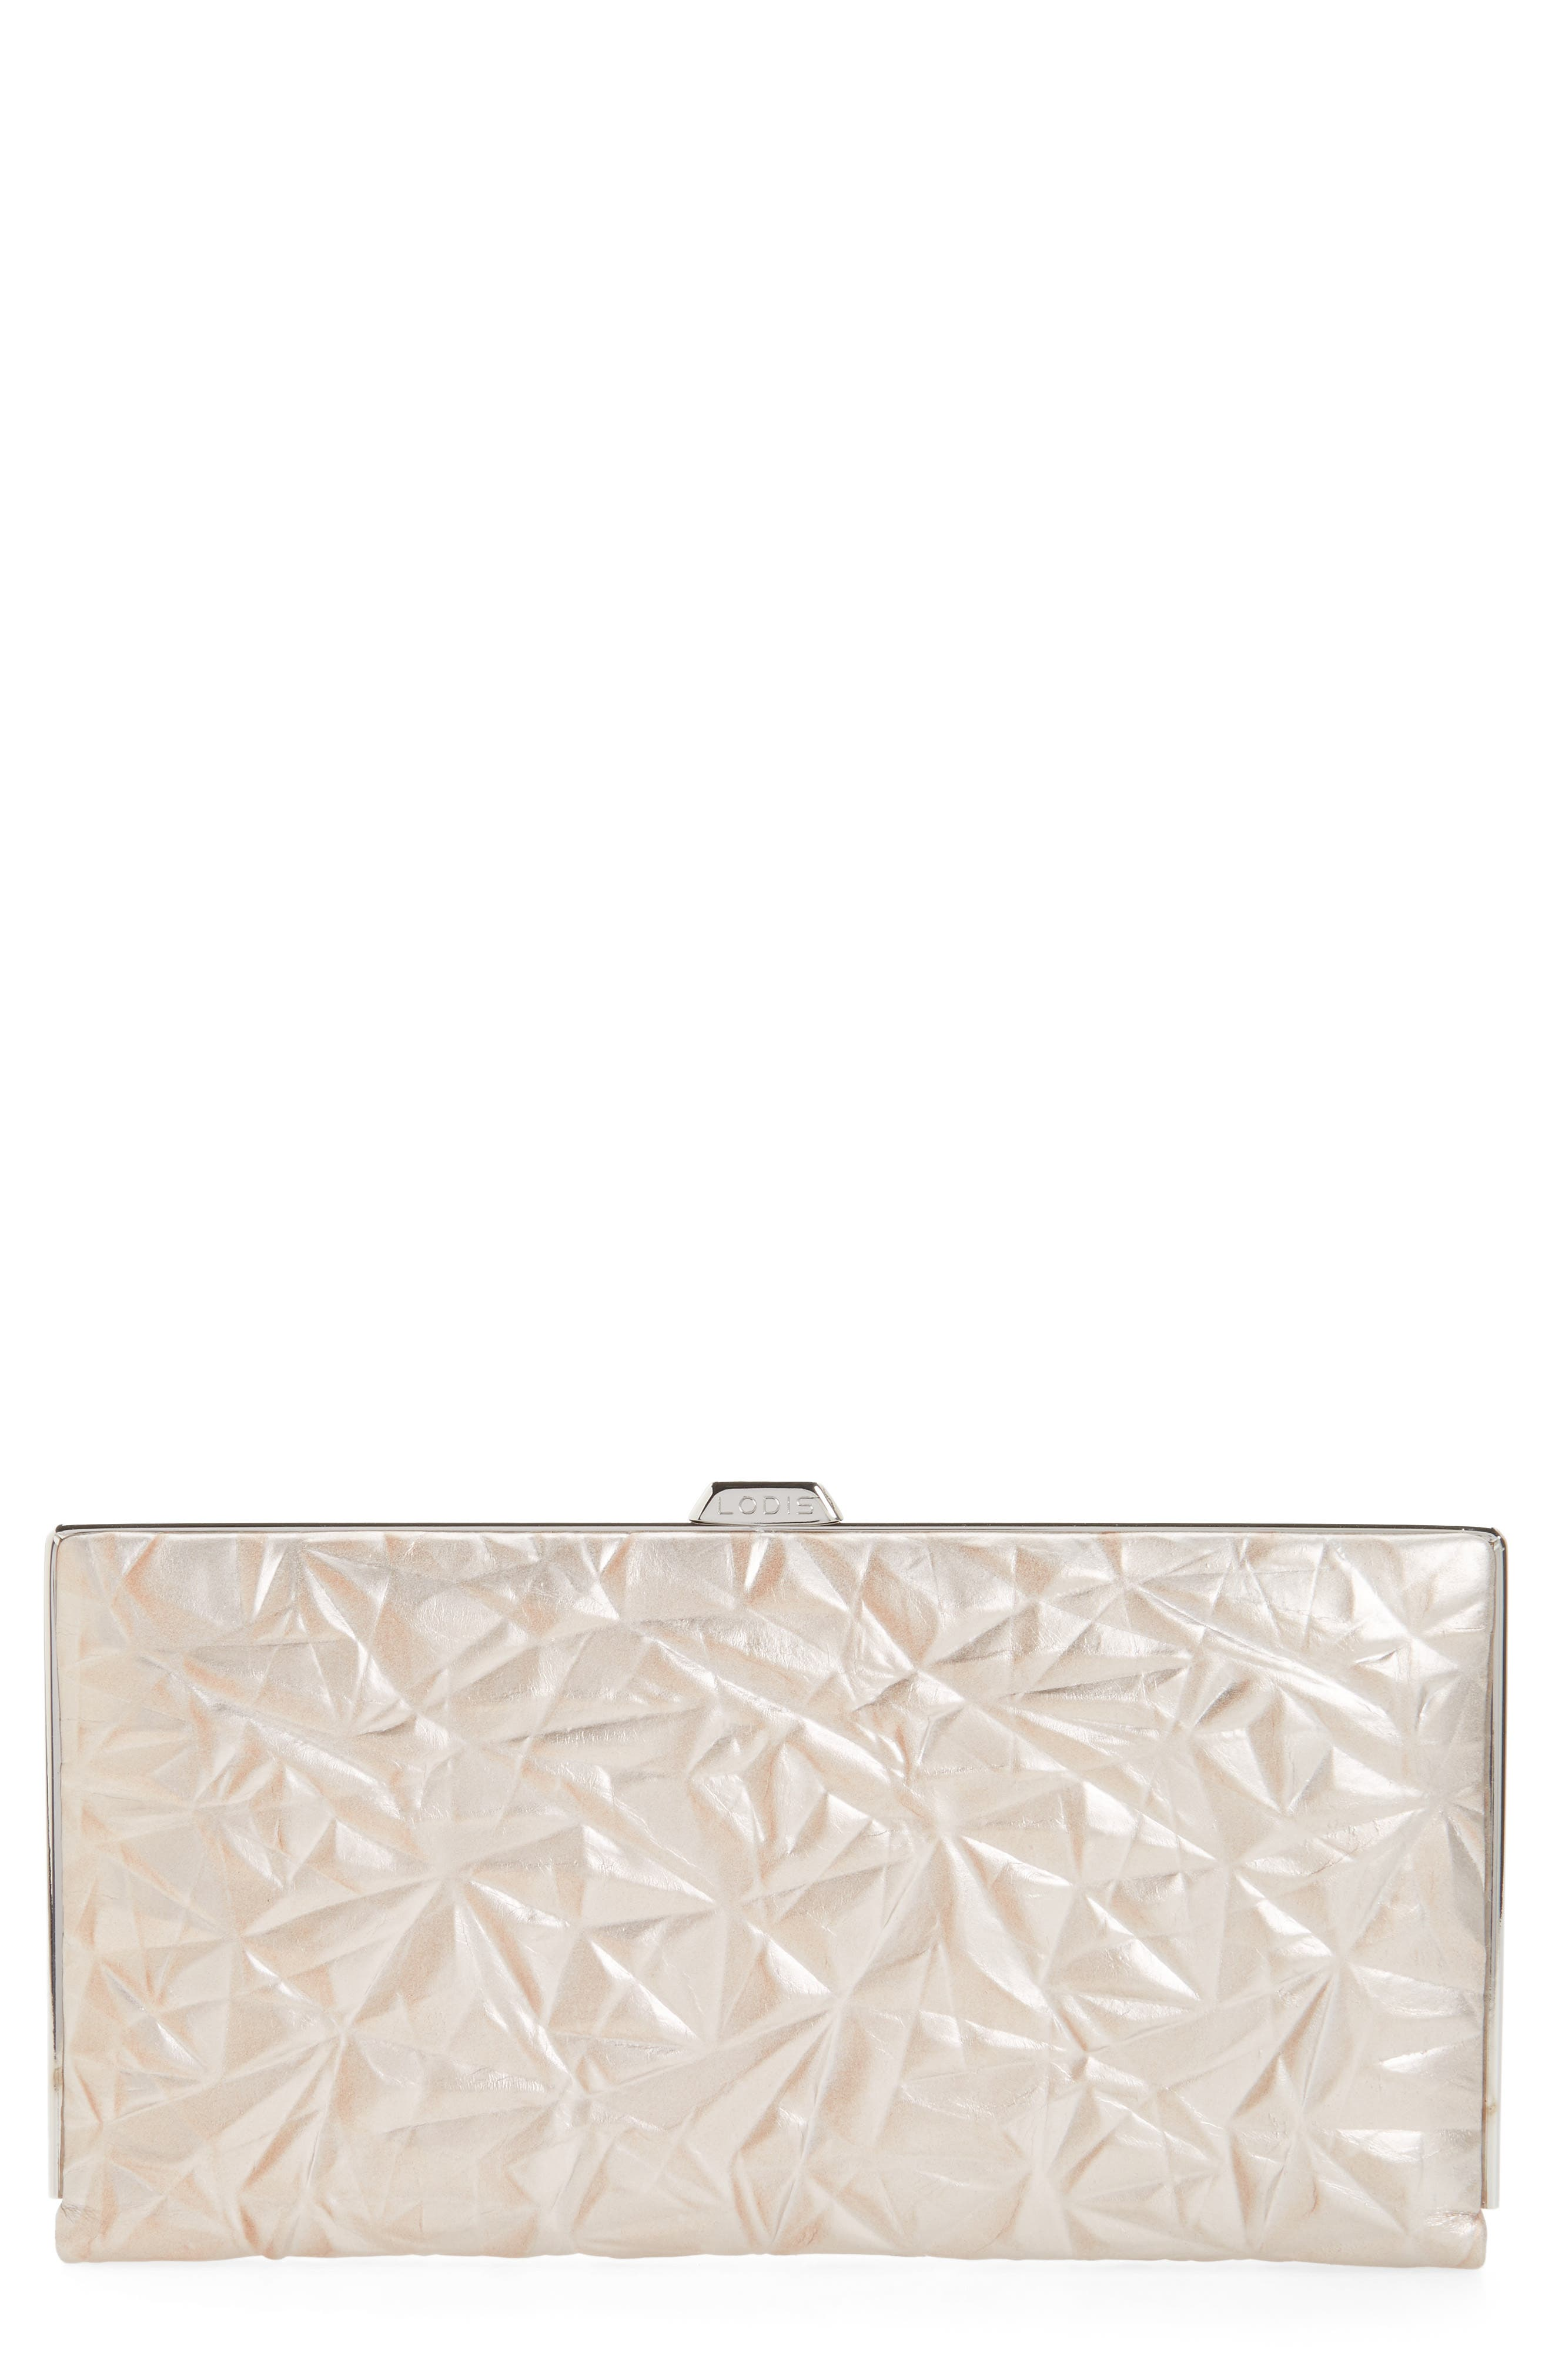 Lodis Quinn Clutch Wallet, Main, color, 200